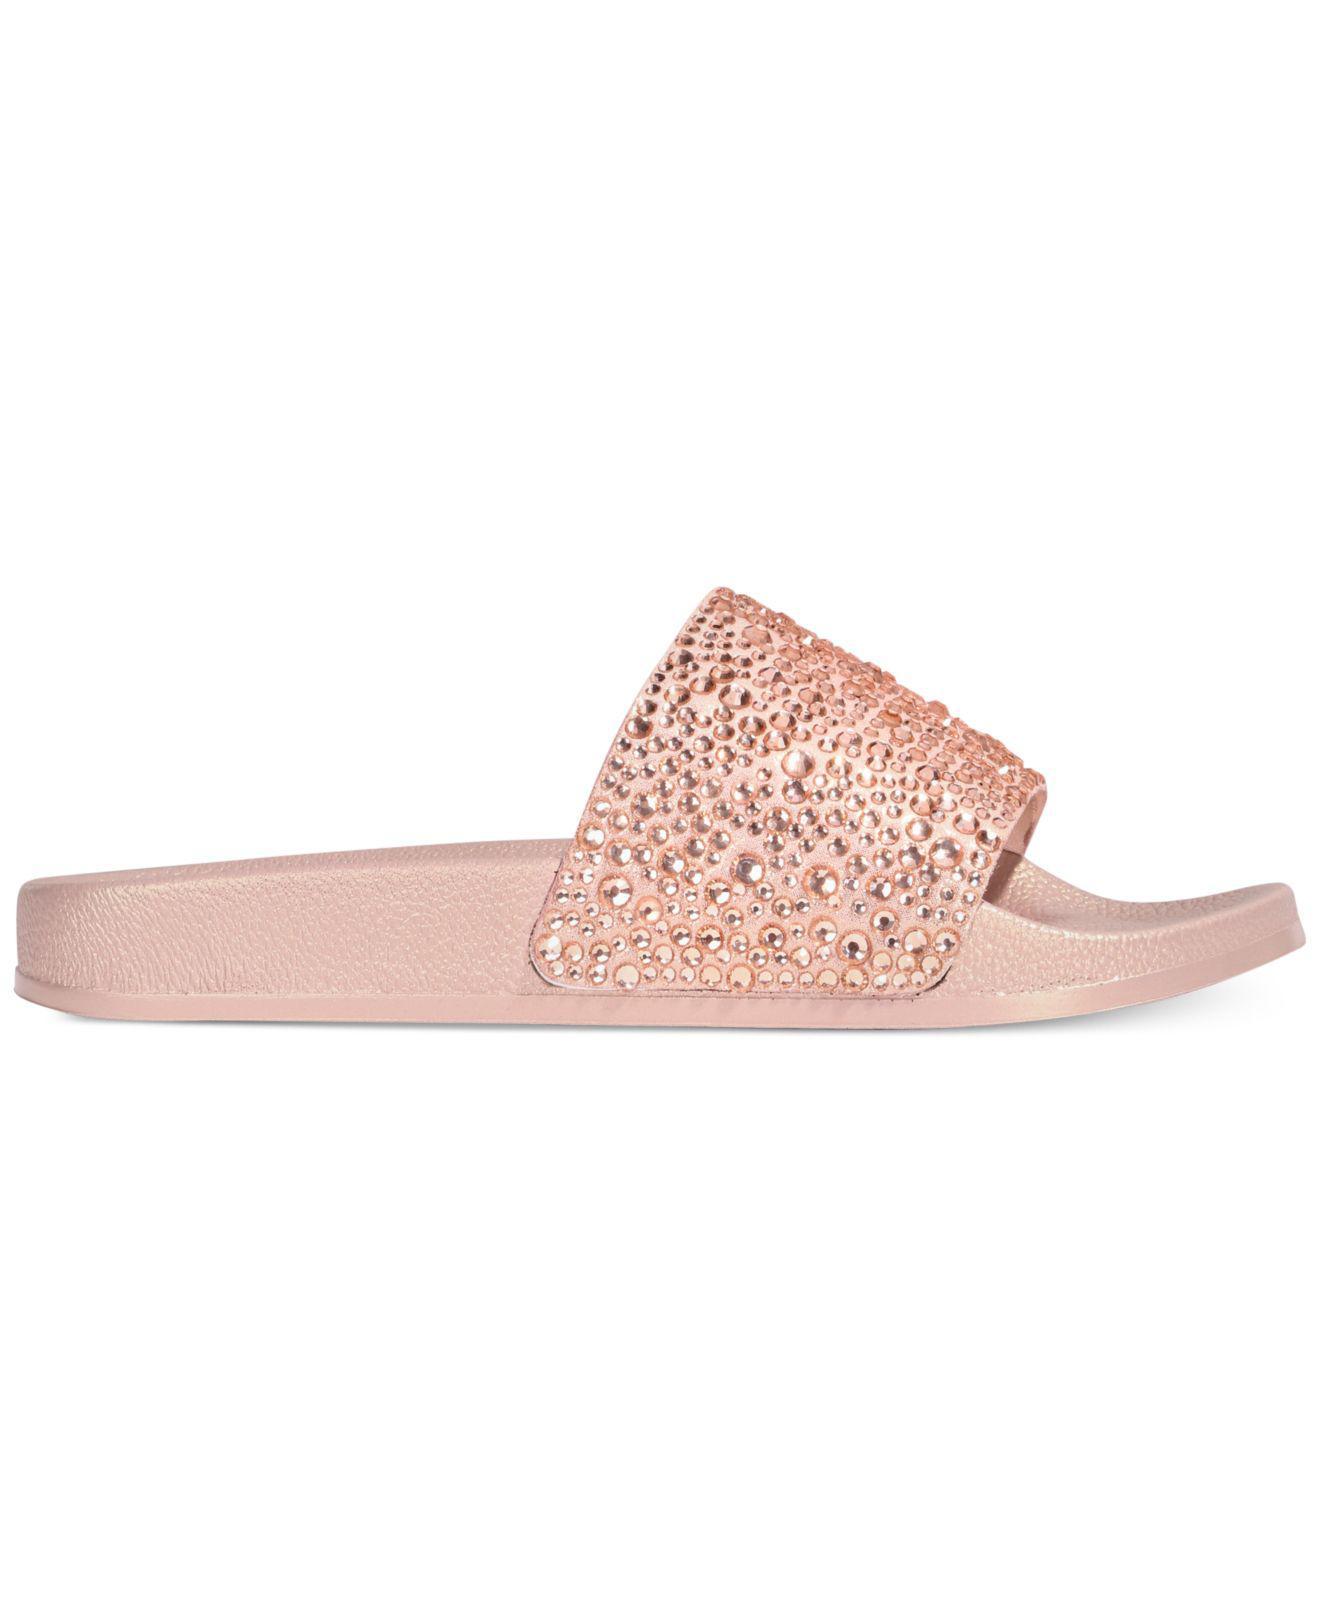 506b1fcb0d07f7 Lyst - INC International Concepts Women s Peymin Flat Slide Sandals in Pink  - Save 20%